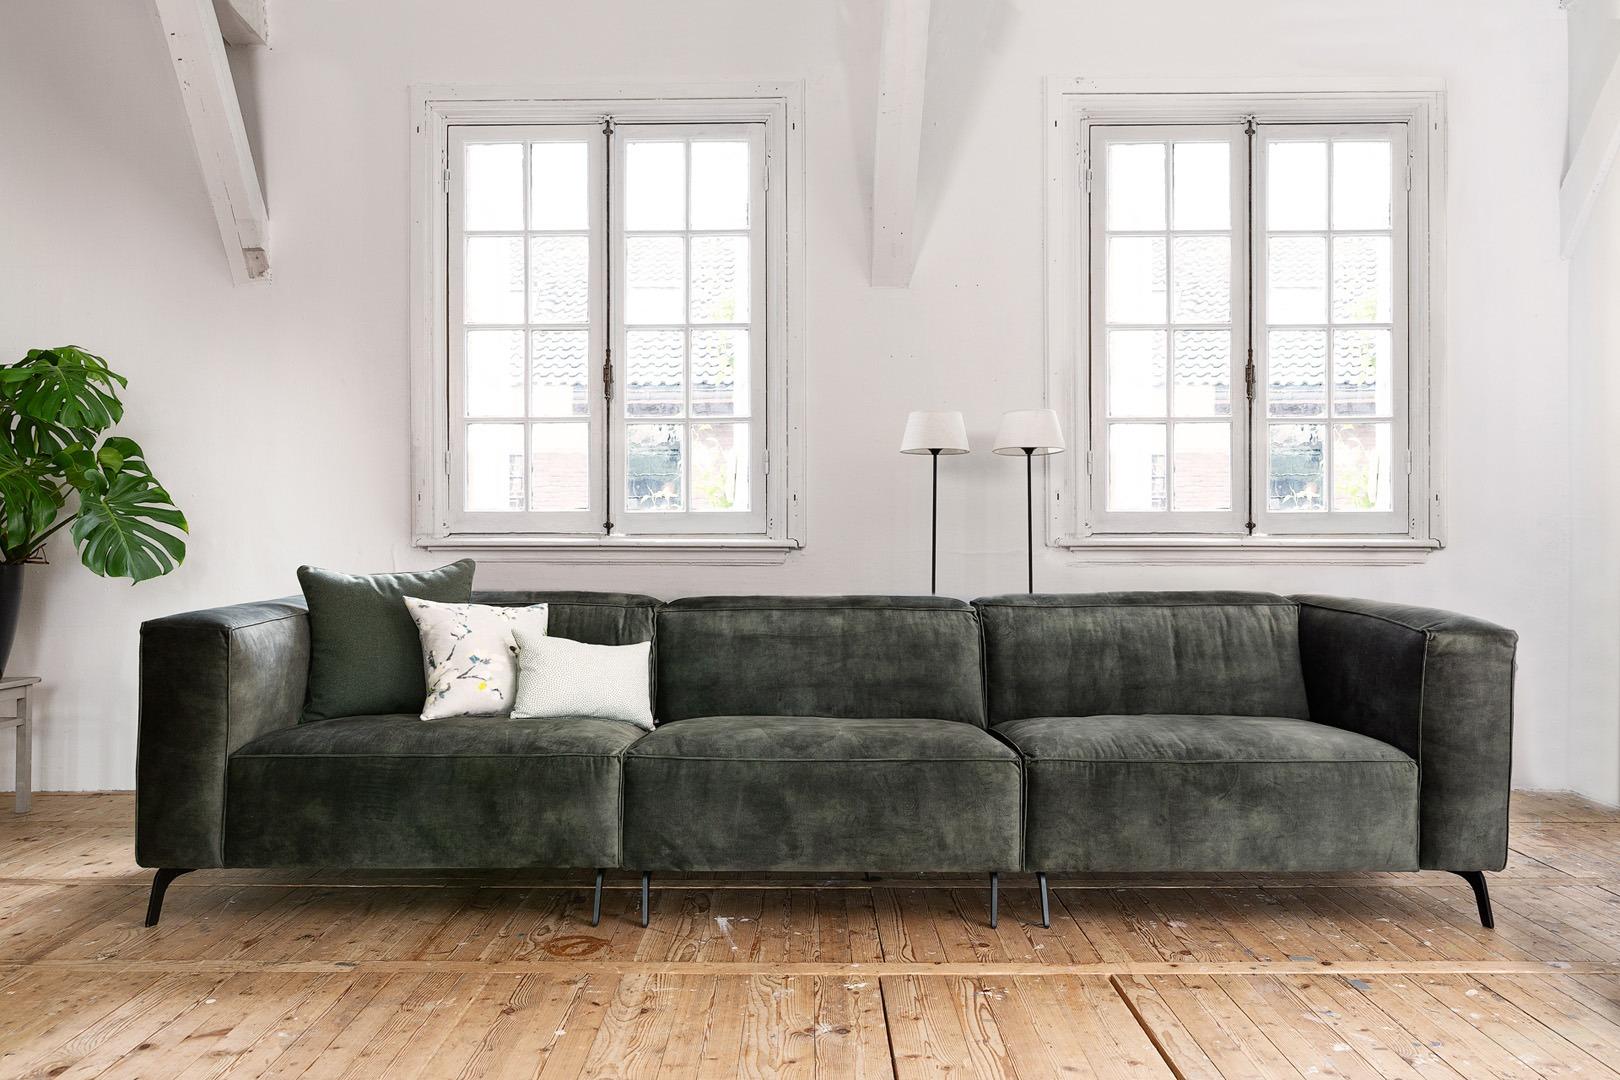 vino-piemonte-bank-groen-stof-soofs-interieur.. (1)